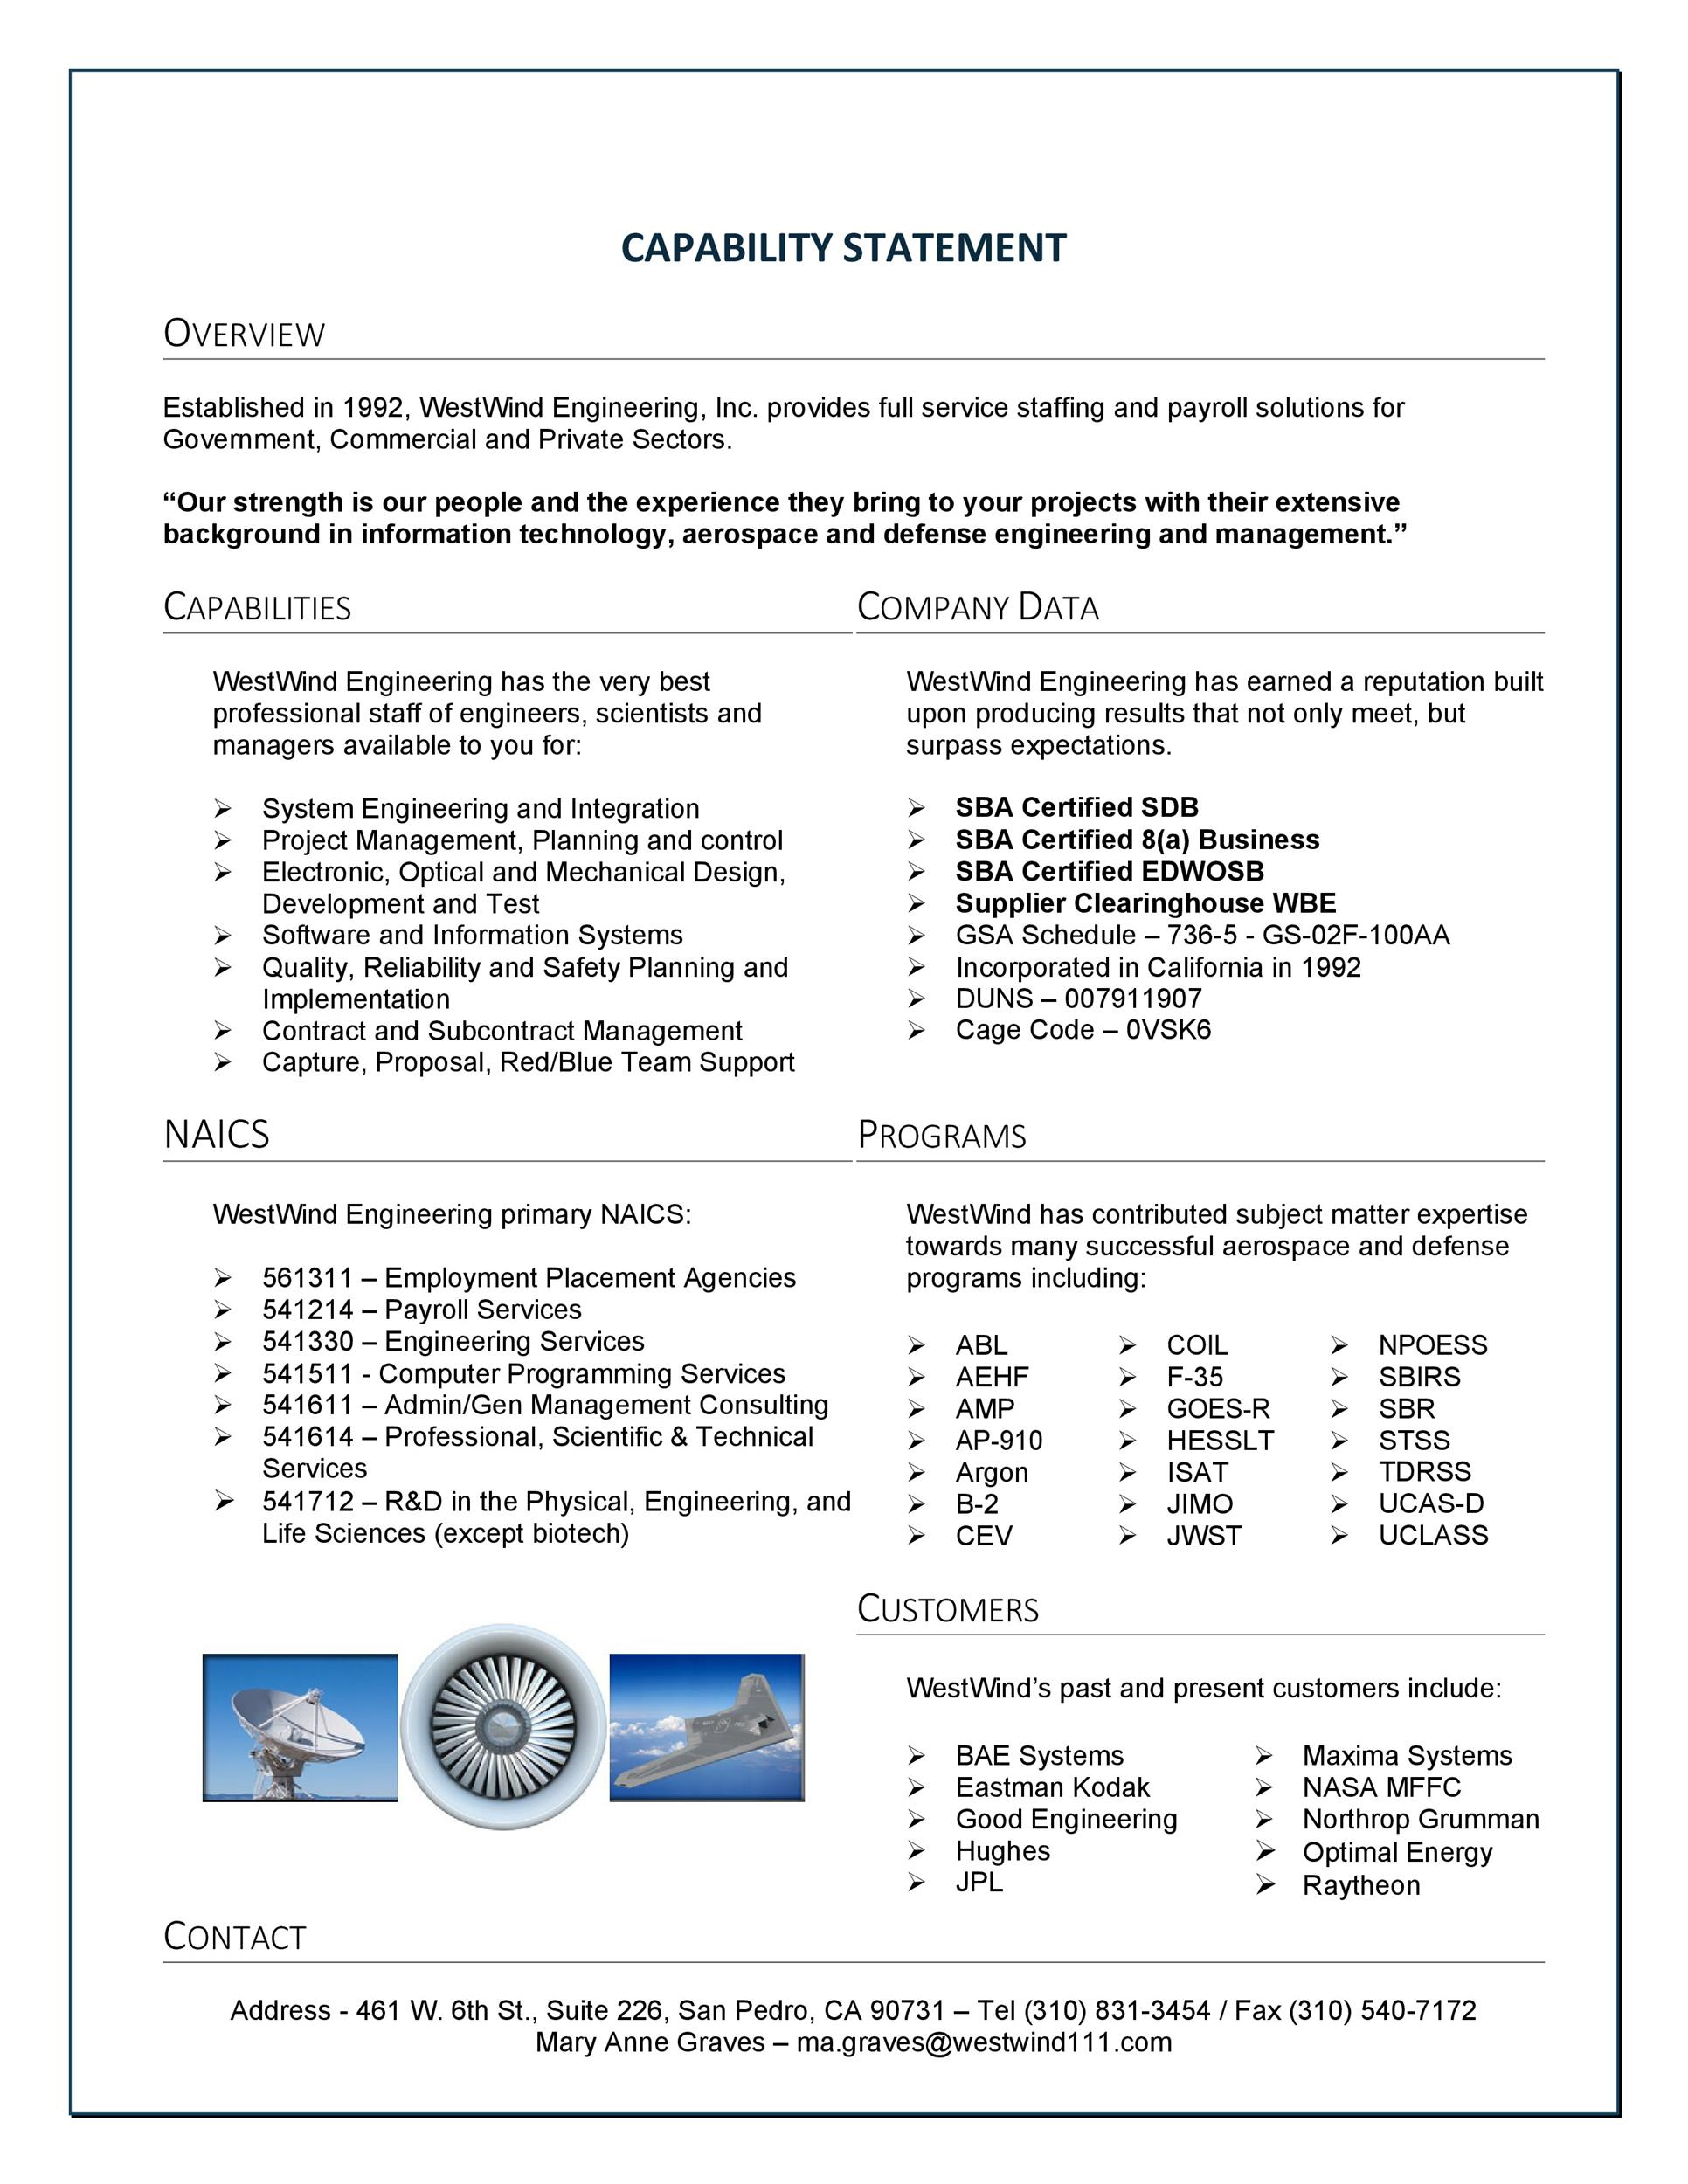 Free capability statement 24